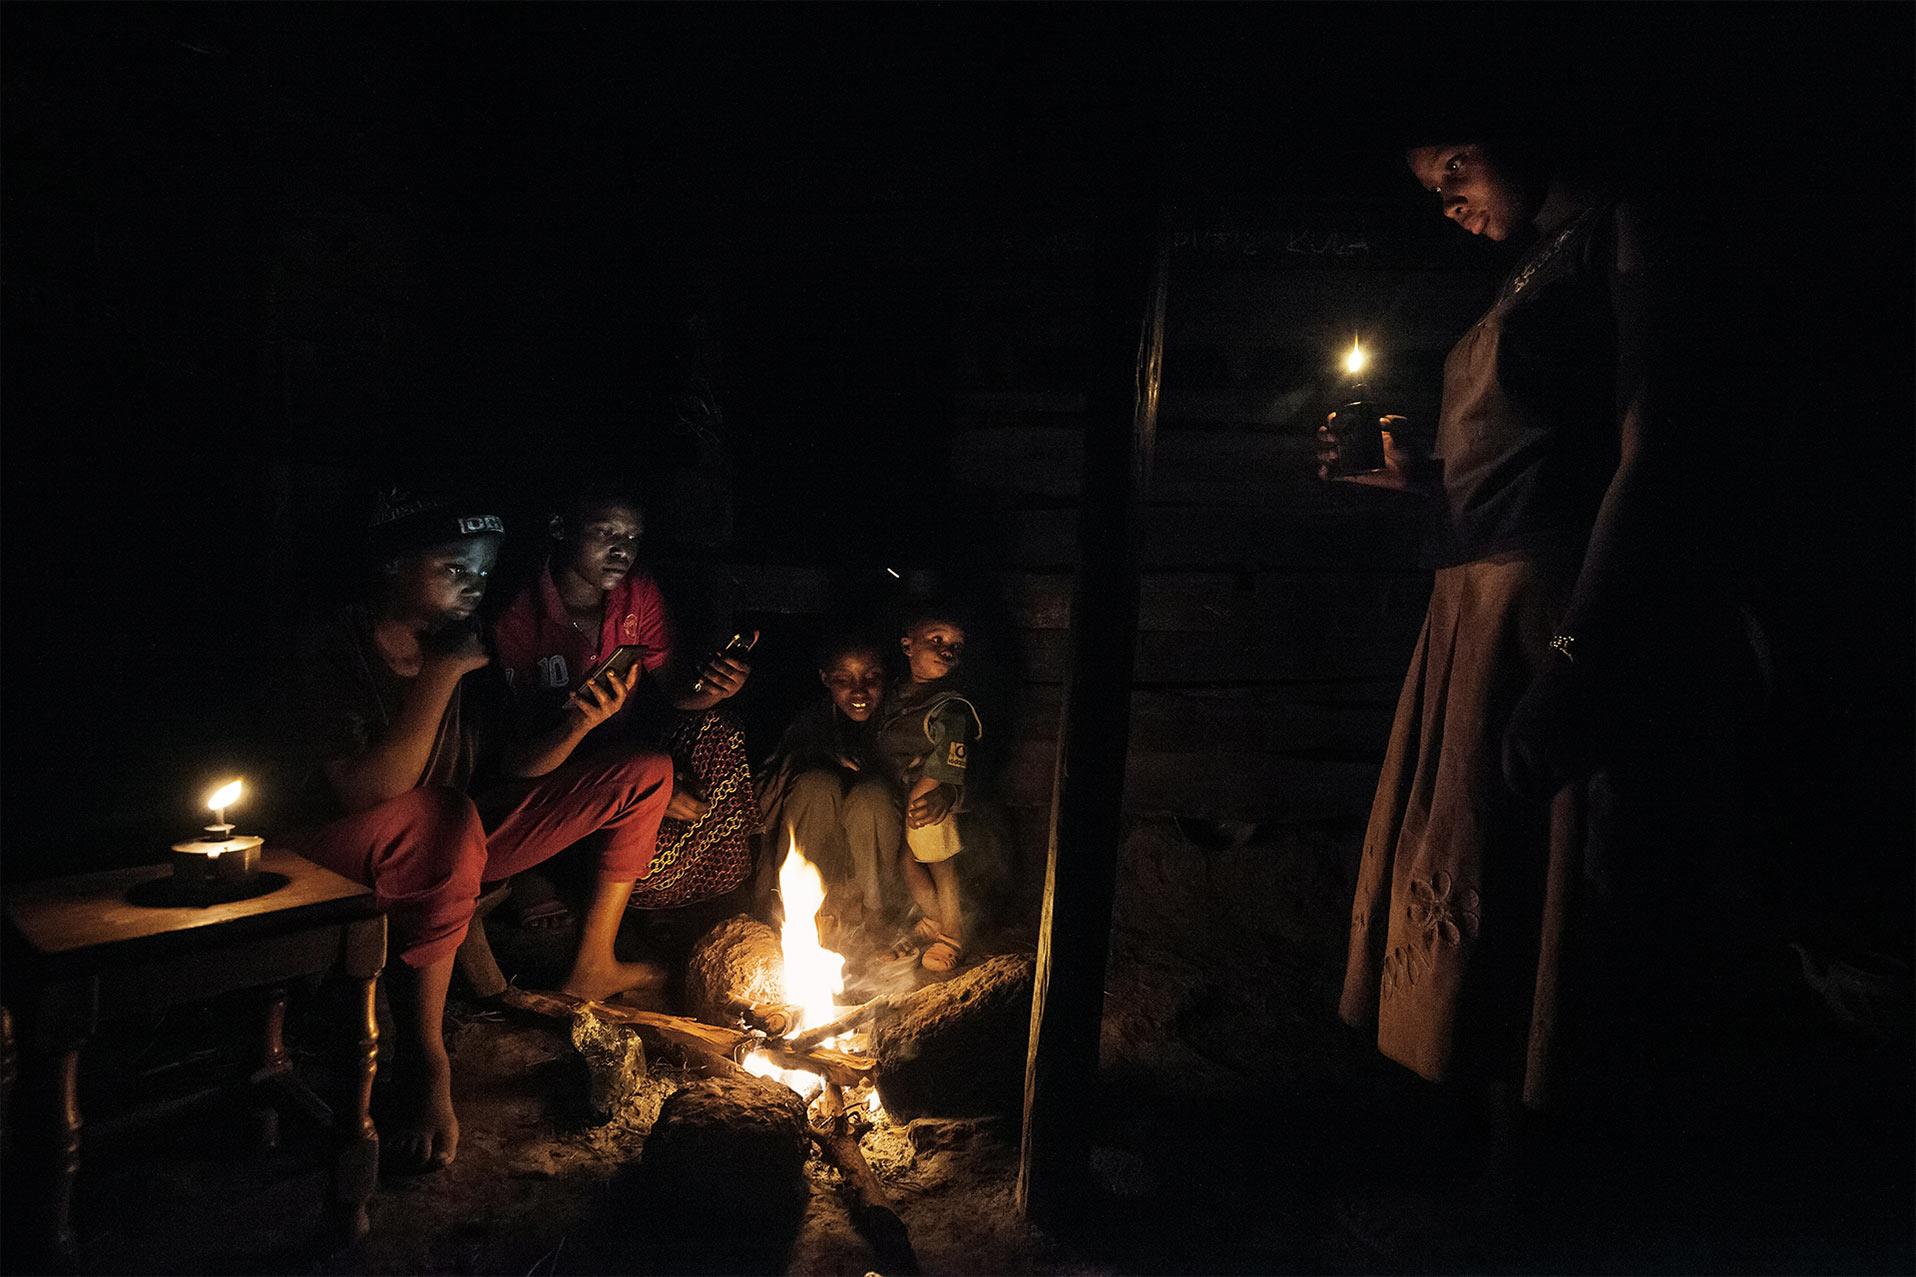 Famiglia senza energia elettrica. Energy portraits - Reportage del fotografo Marco Garofalo